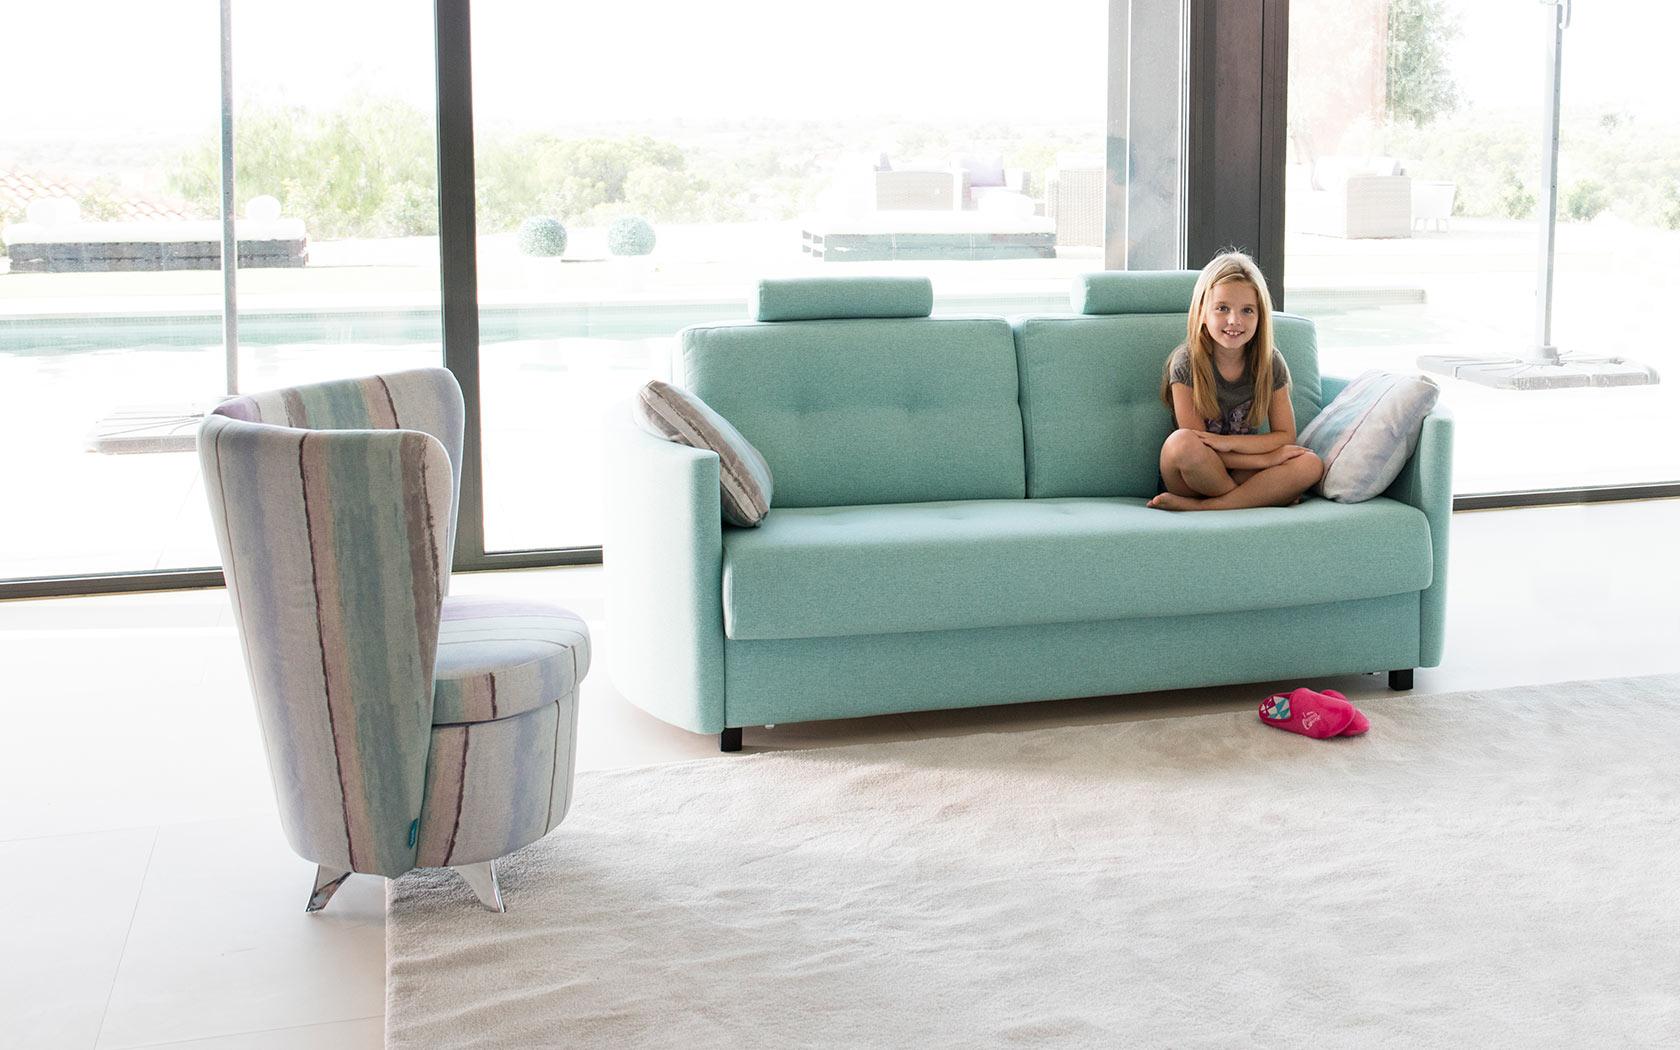 Bolero sofa cama 2019 02